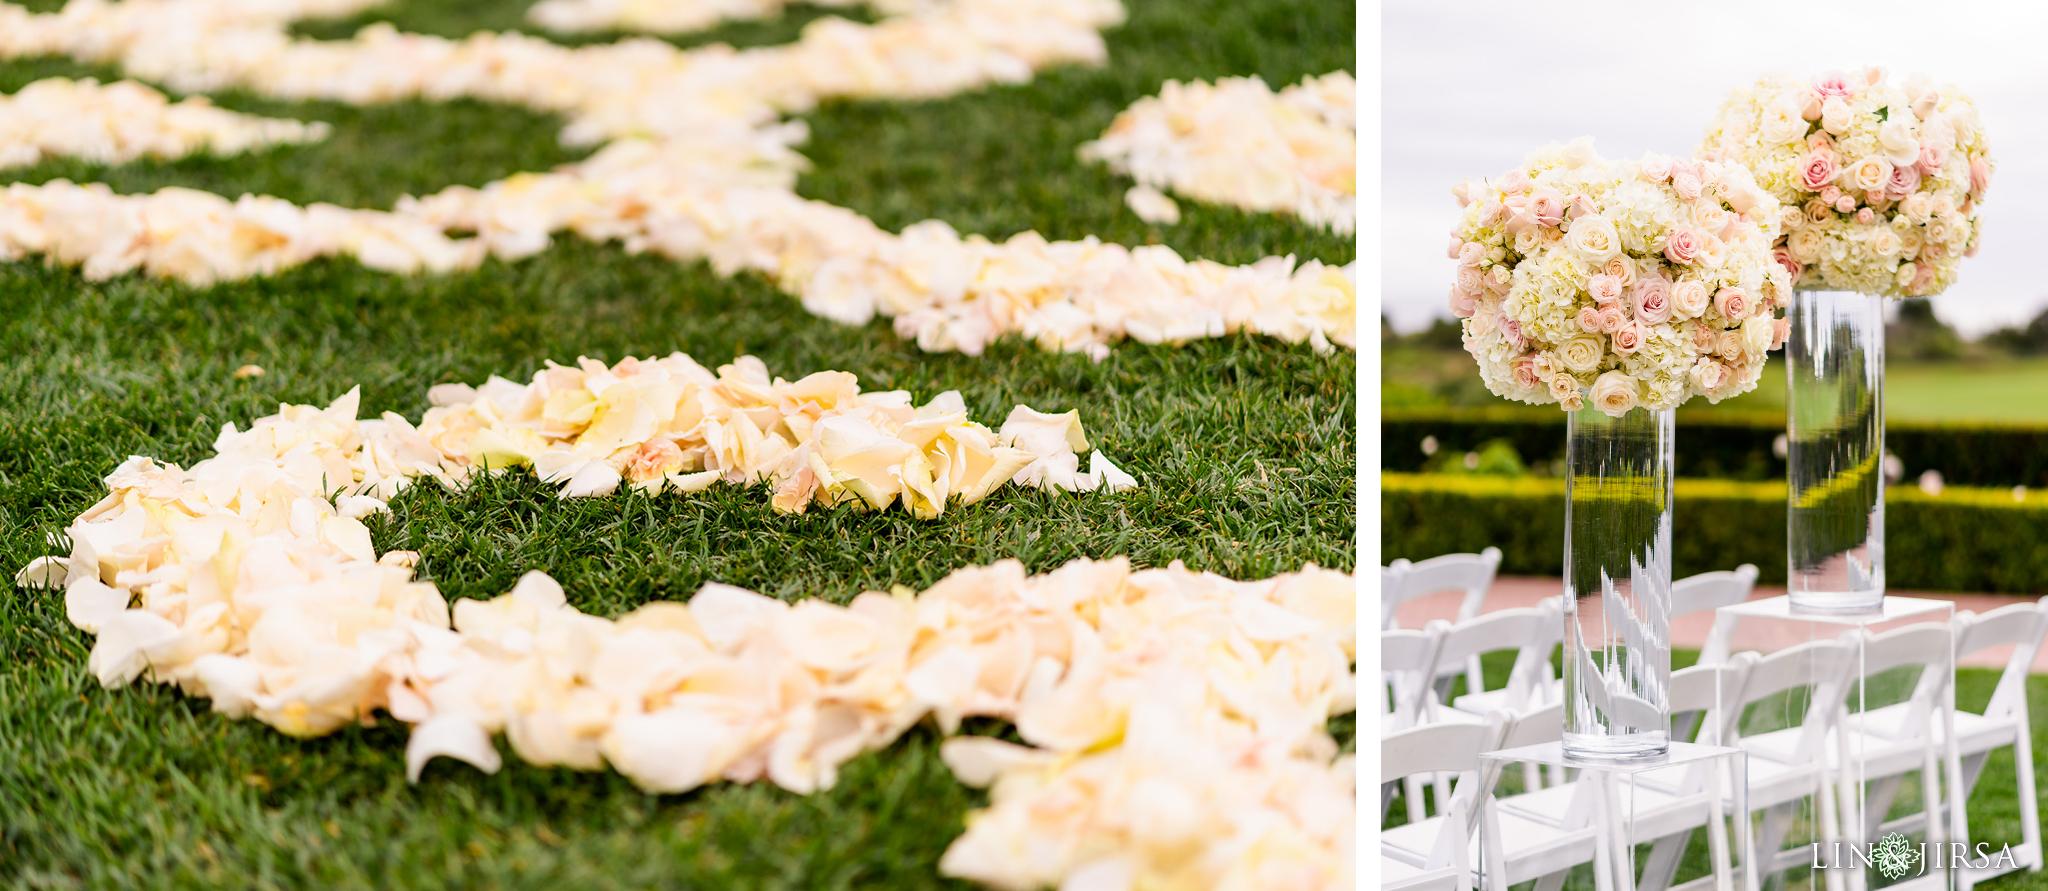 09 Pelican Hill Resort Orange County Wedding Photographer